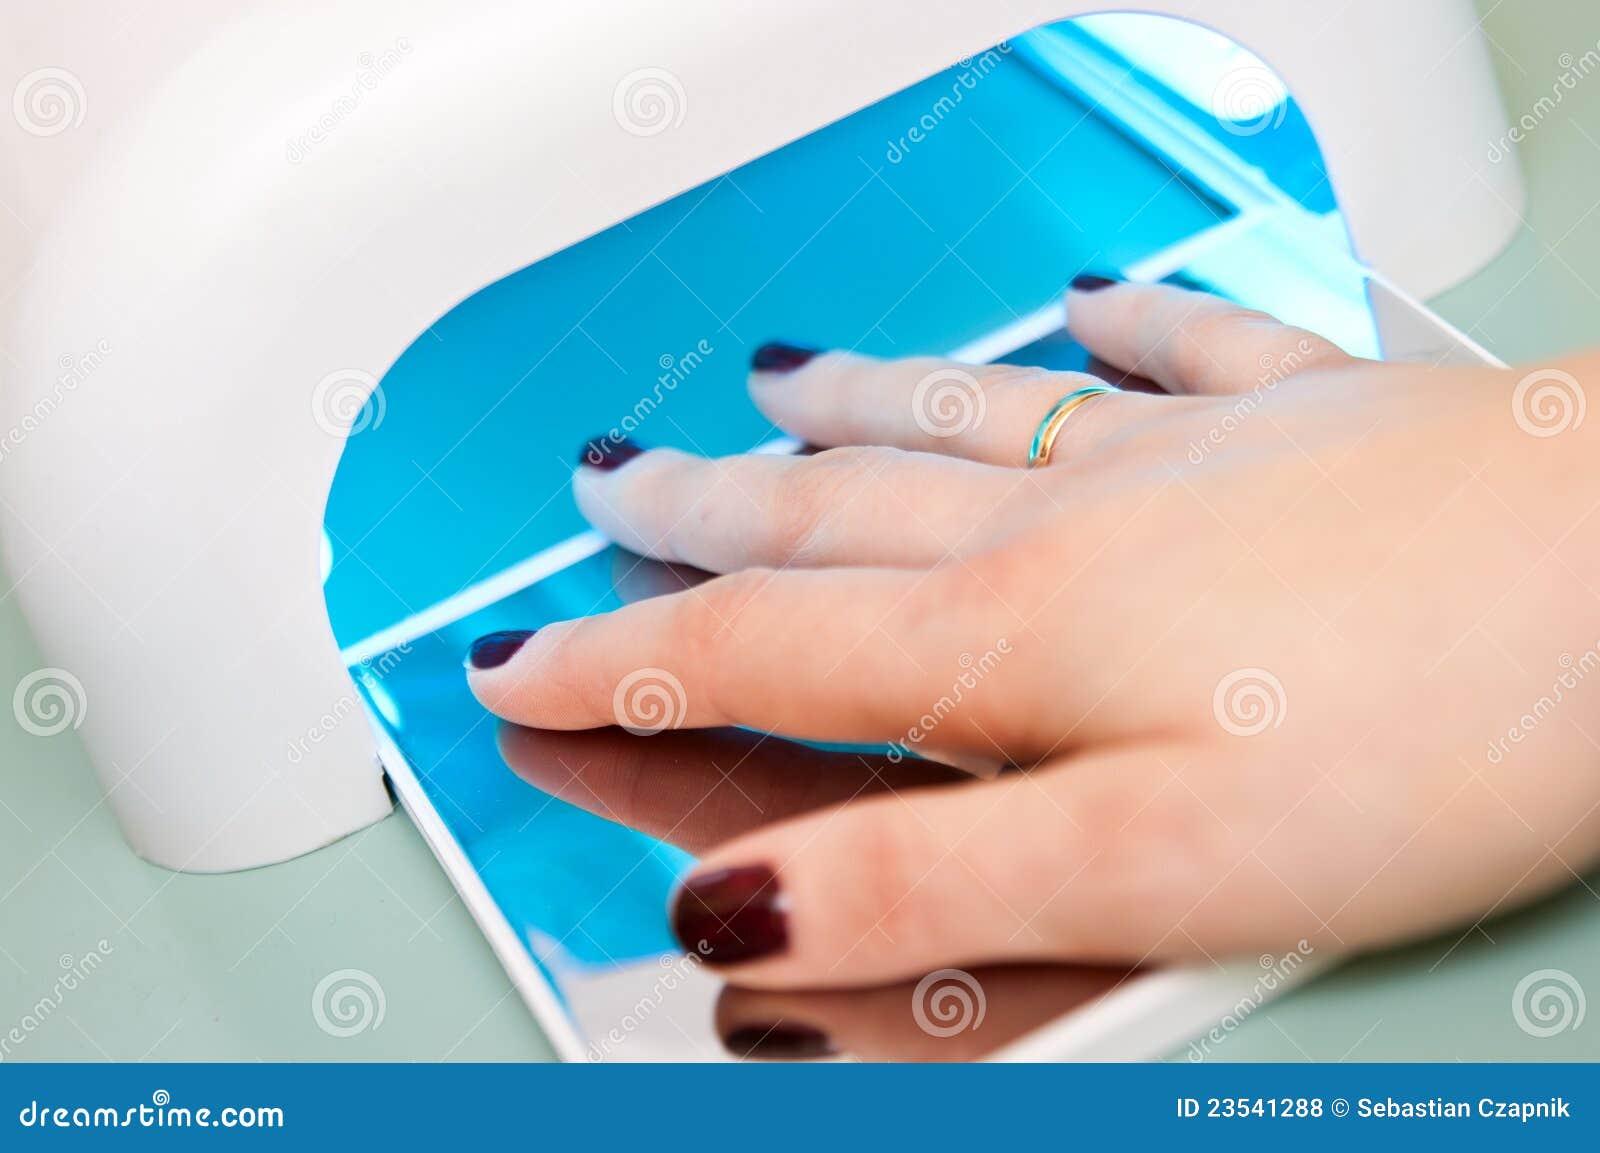 fingernail machine